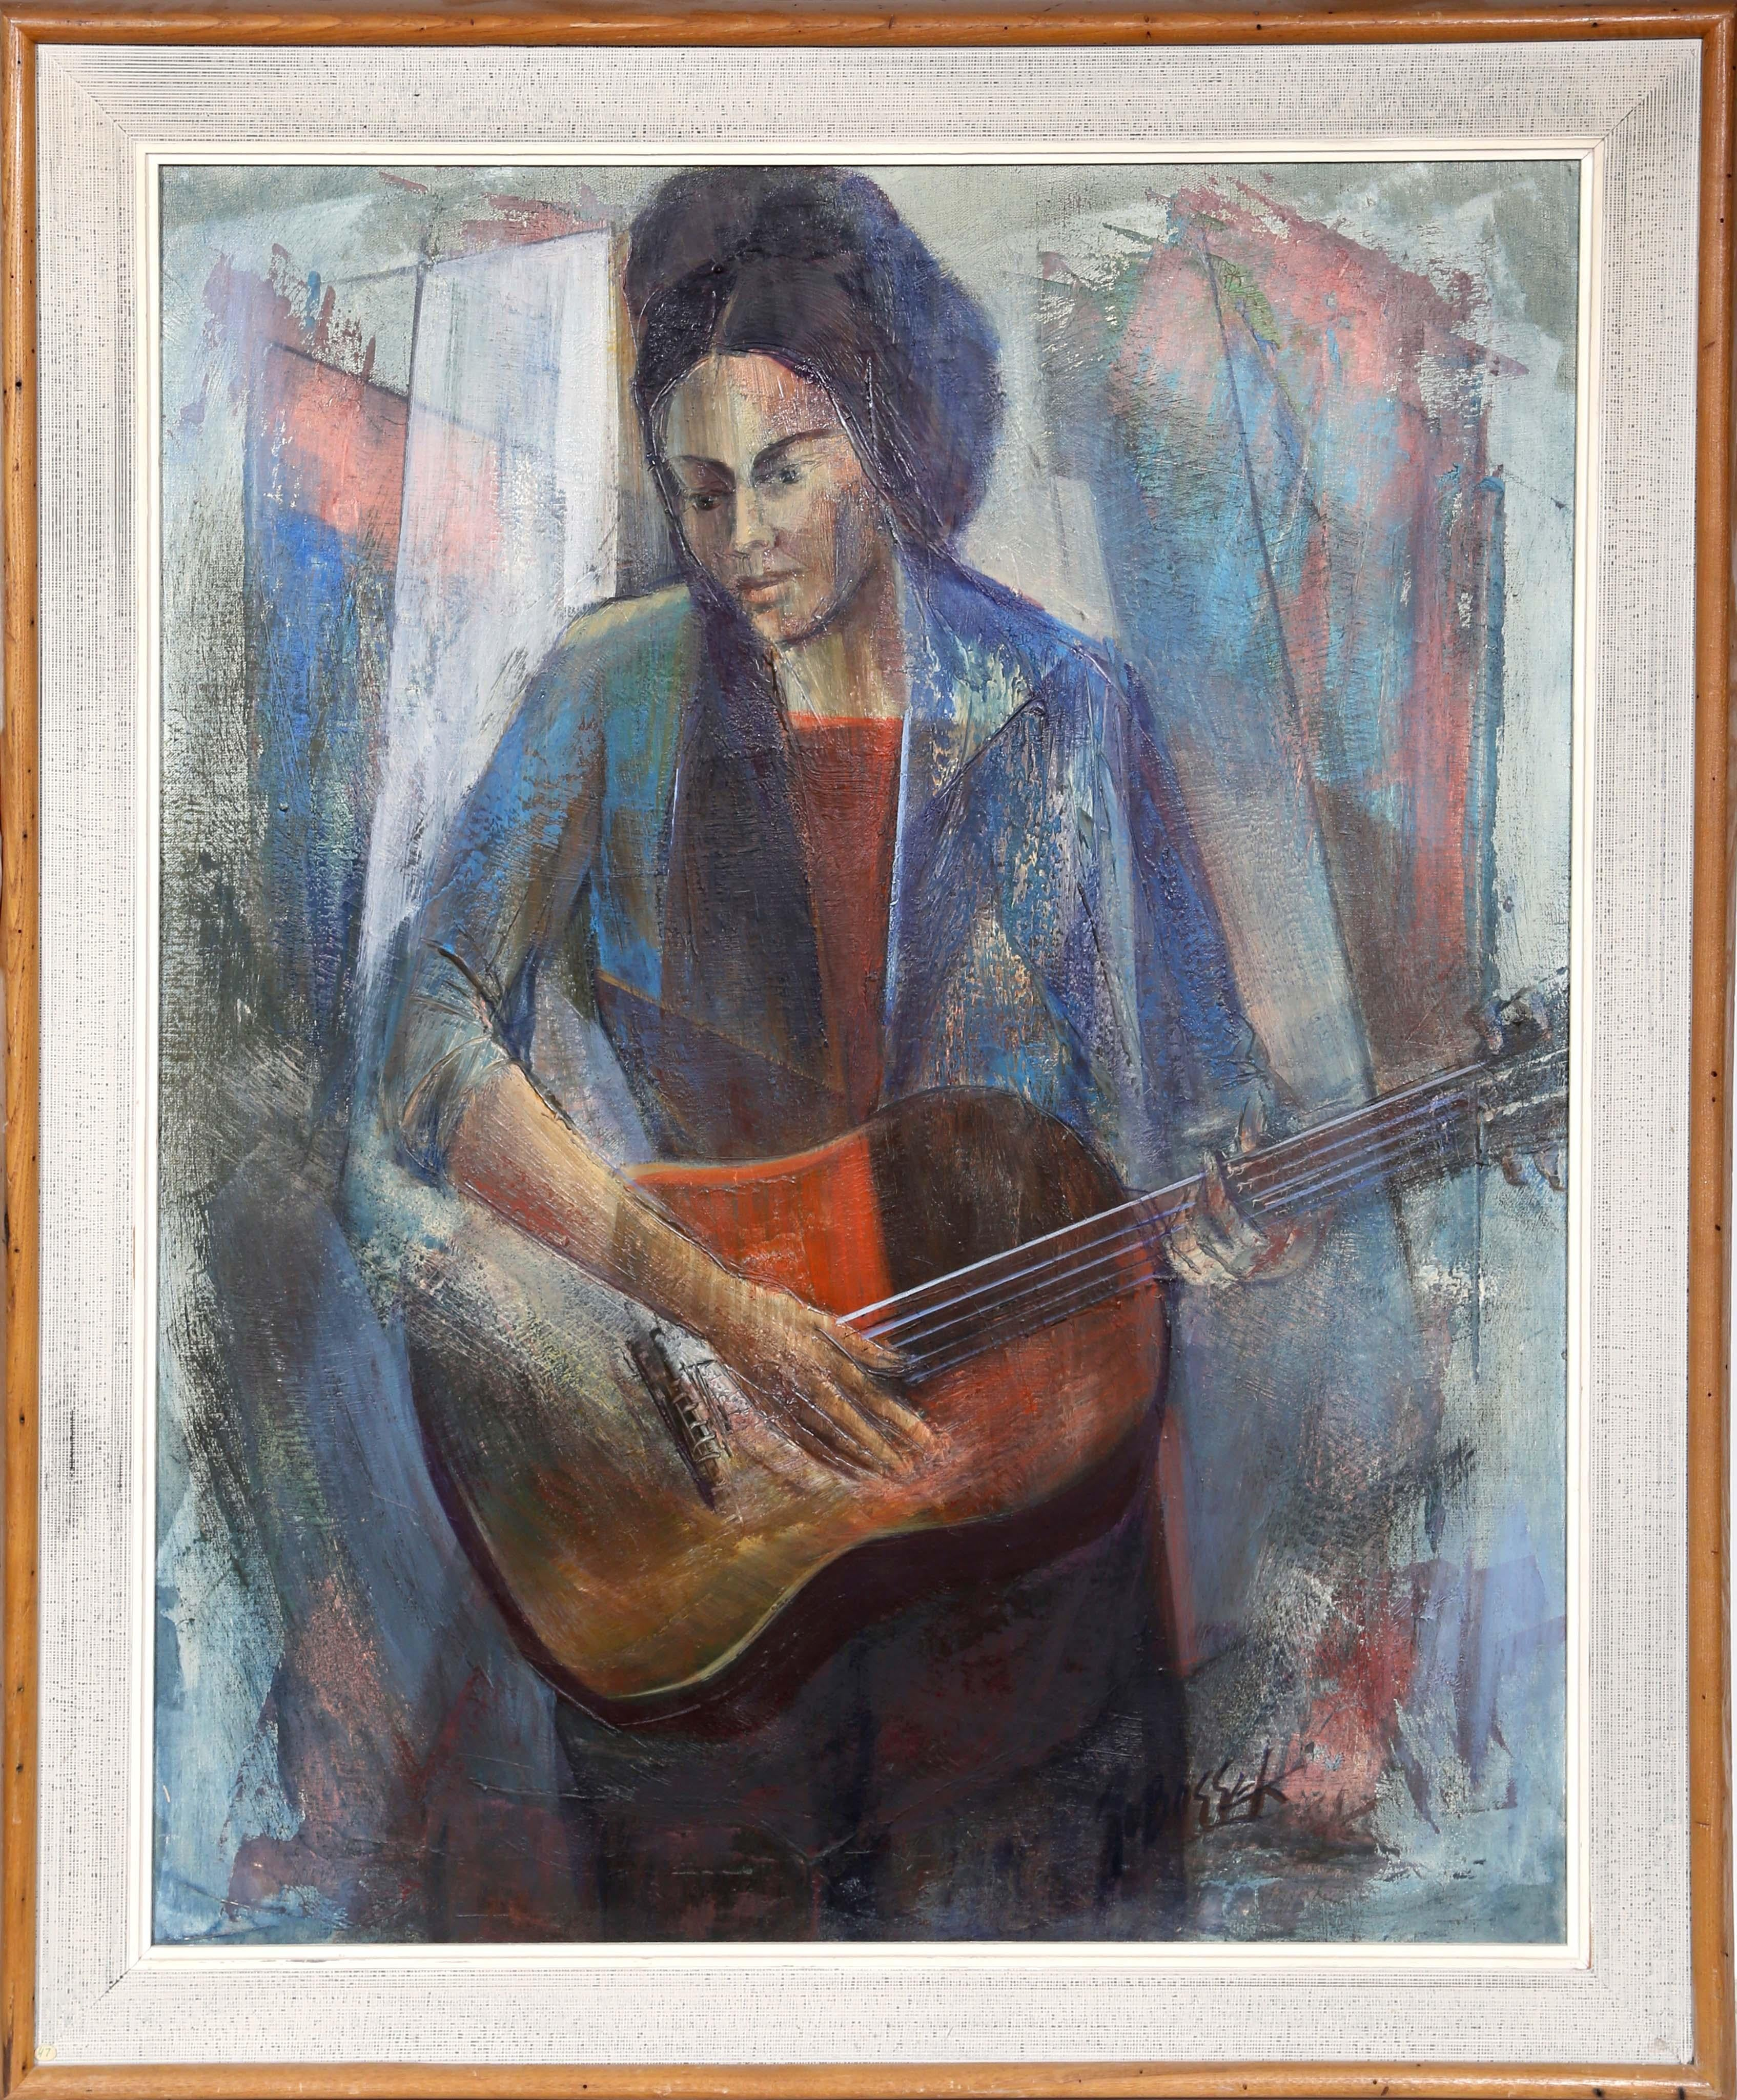 Ballad of the Blues, Oil Painting by Stanley Sobossek